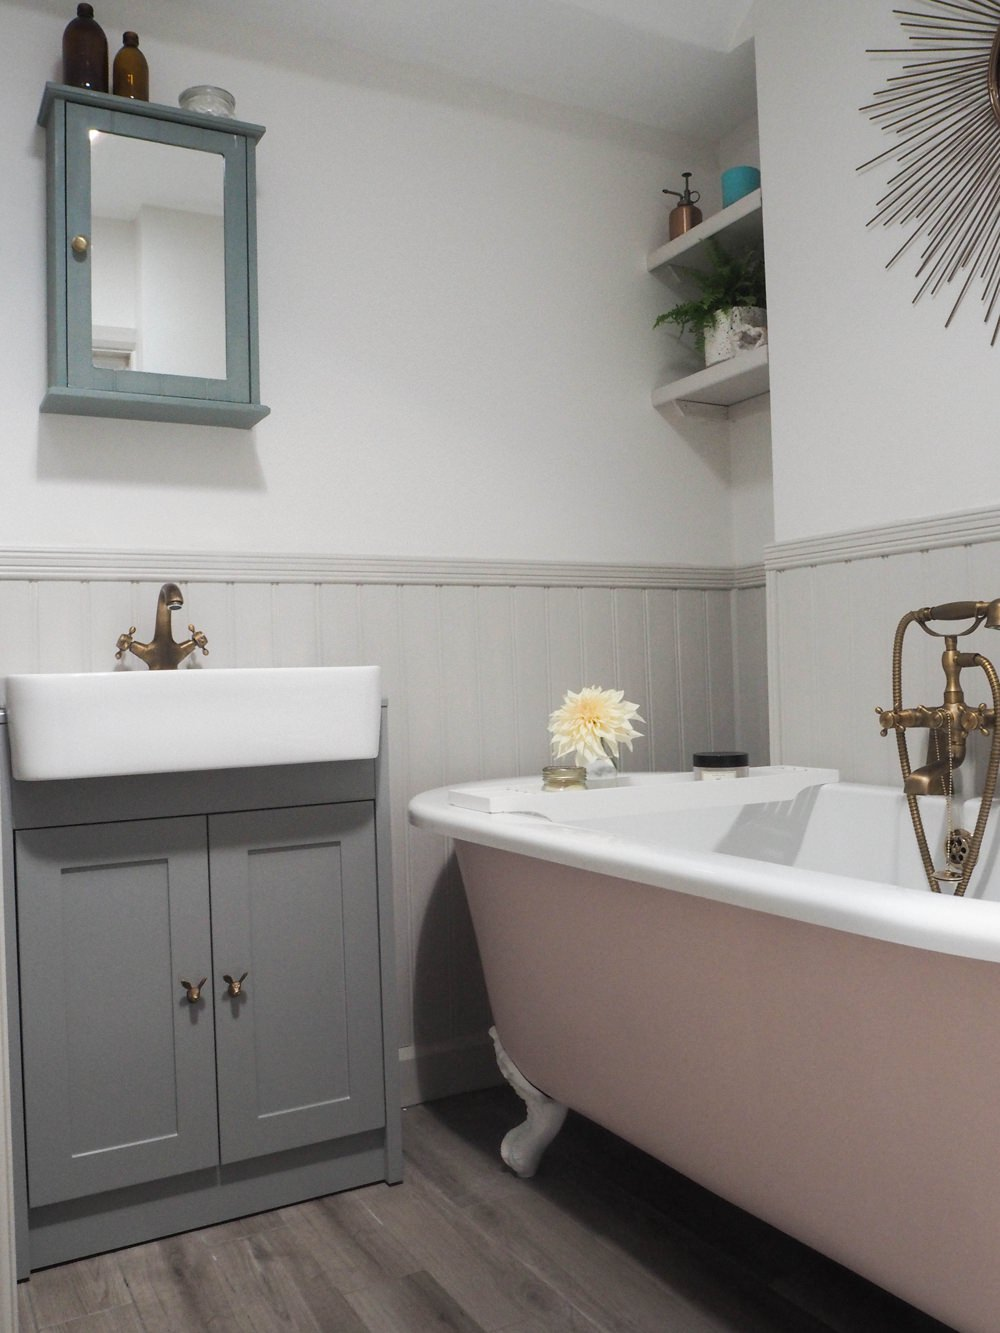 Bathroom Pink Roll Top Bath Renovation 1930s Brass Taps Panelling Walls Farrow & Ball Floor Tiles